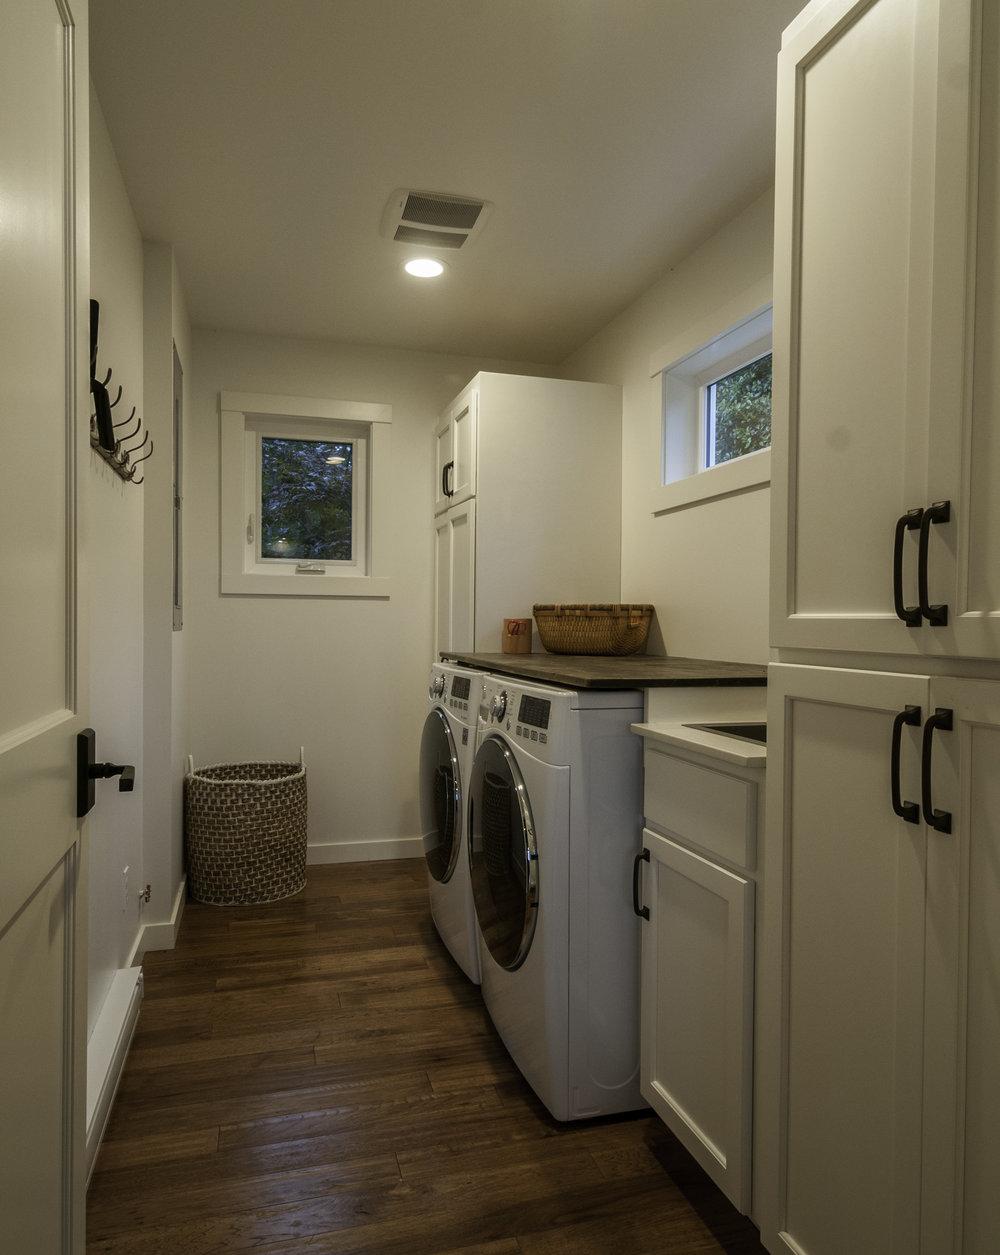 LaundryRm.jpg